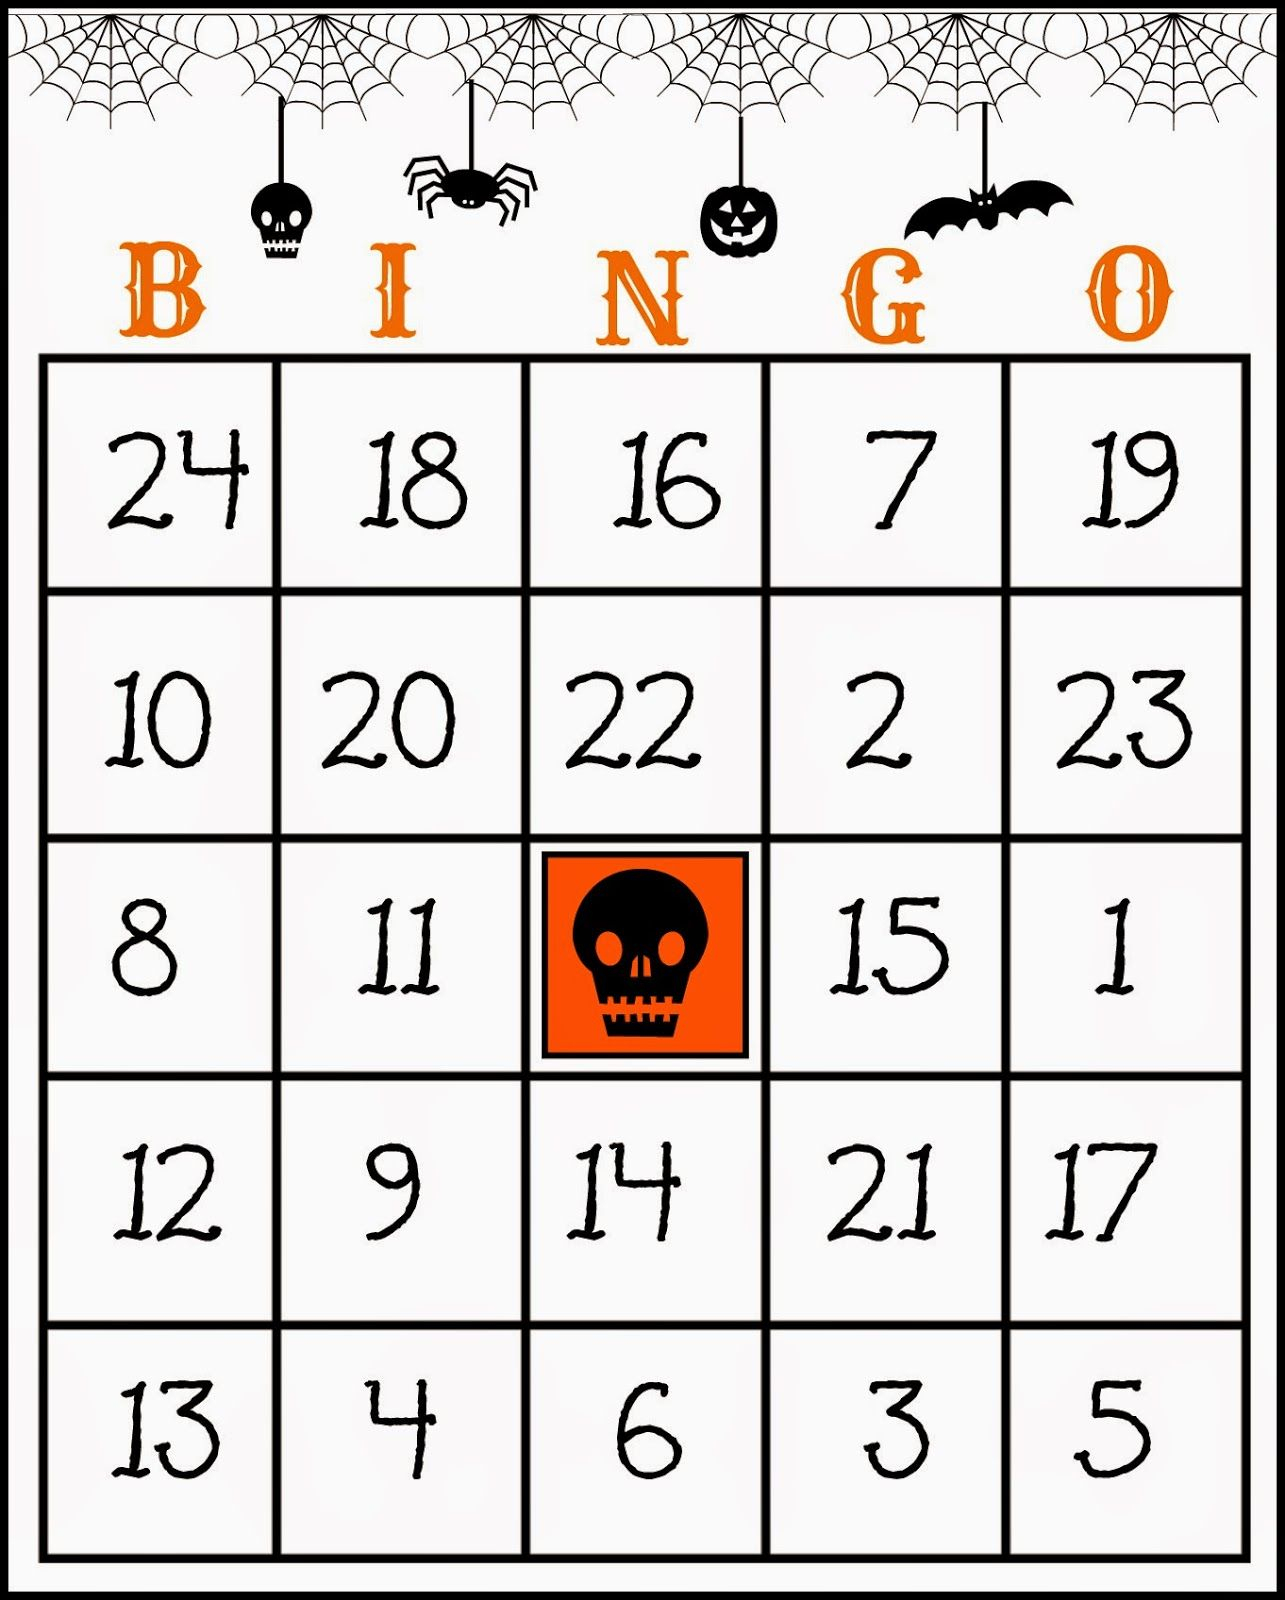 Crafty In Crosby: Free Printable Halloween Bingo Game | Products I - Free Printable Halloween Bingo Cards